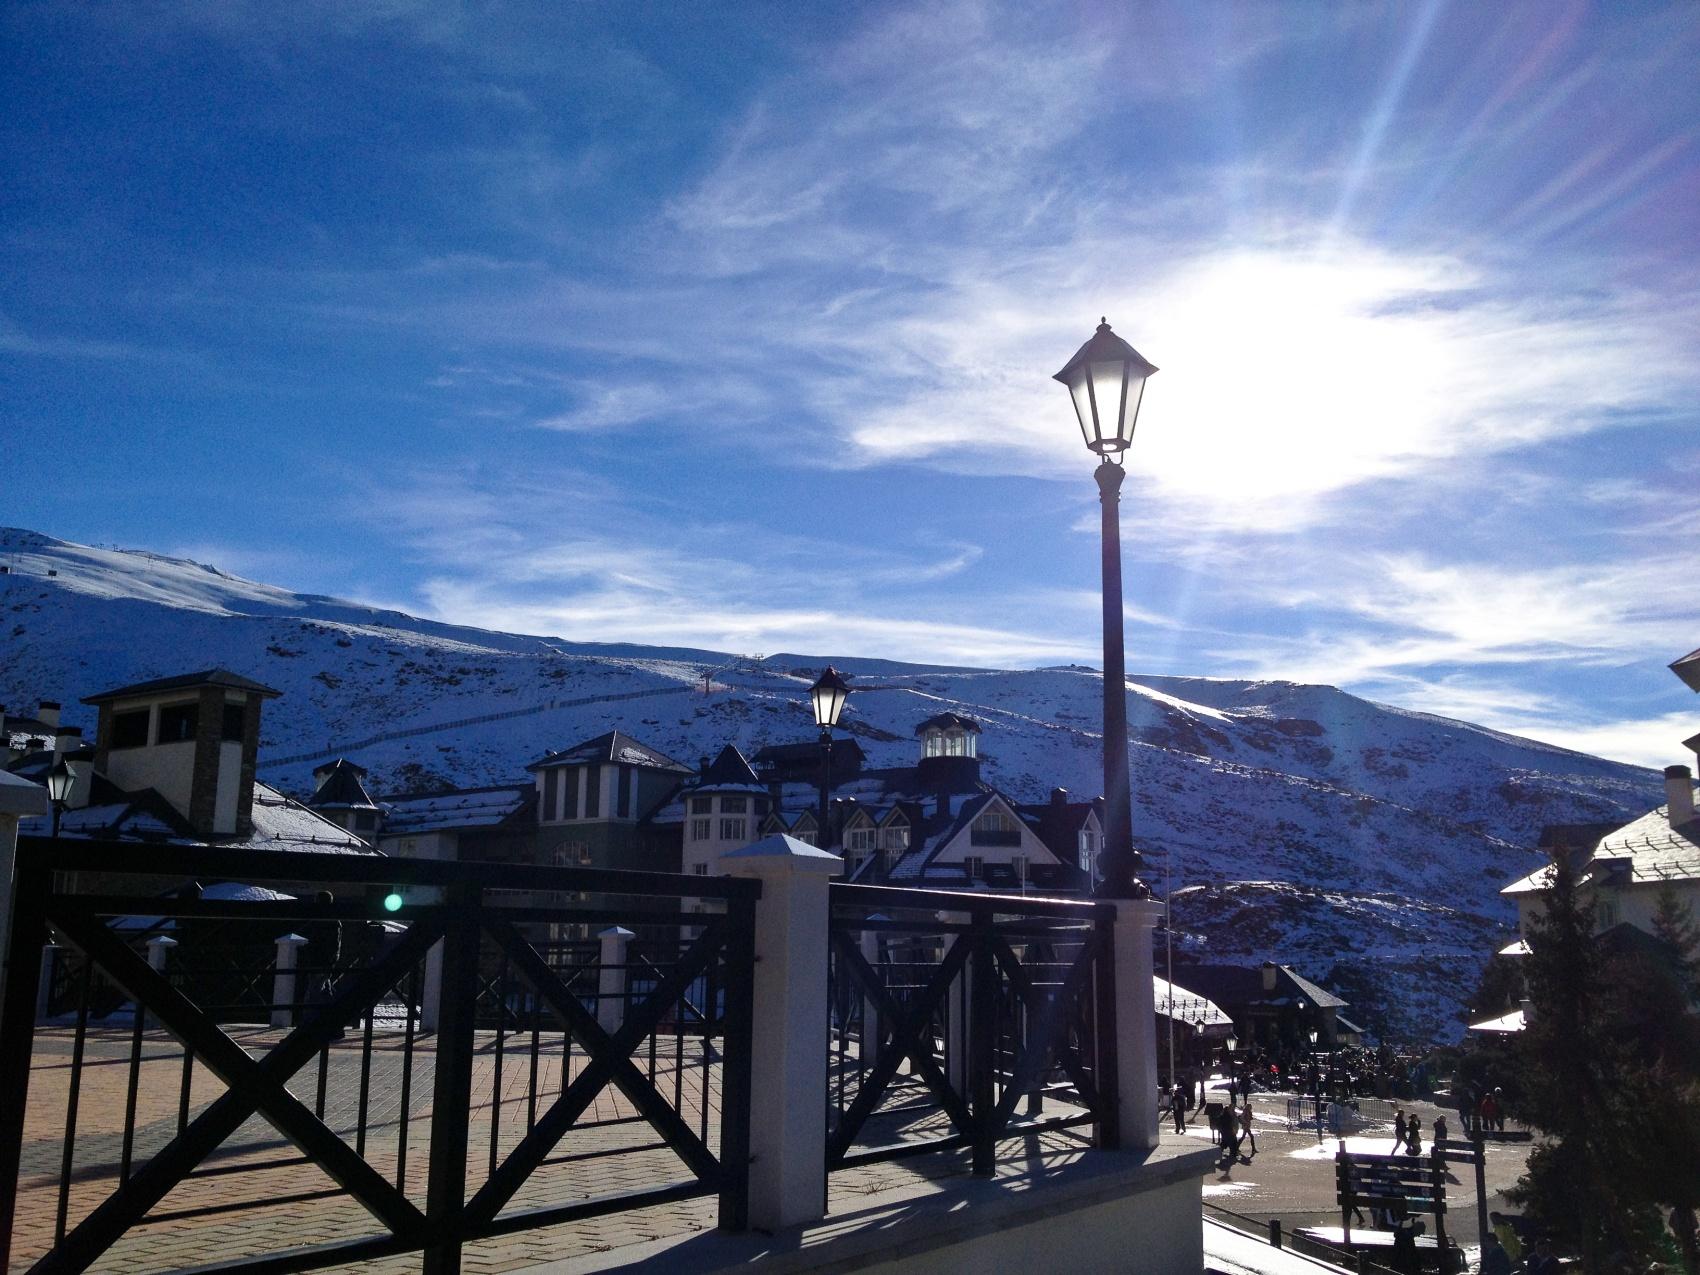 Caught In Time - Sierra Nevada, Granada